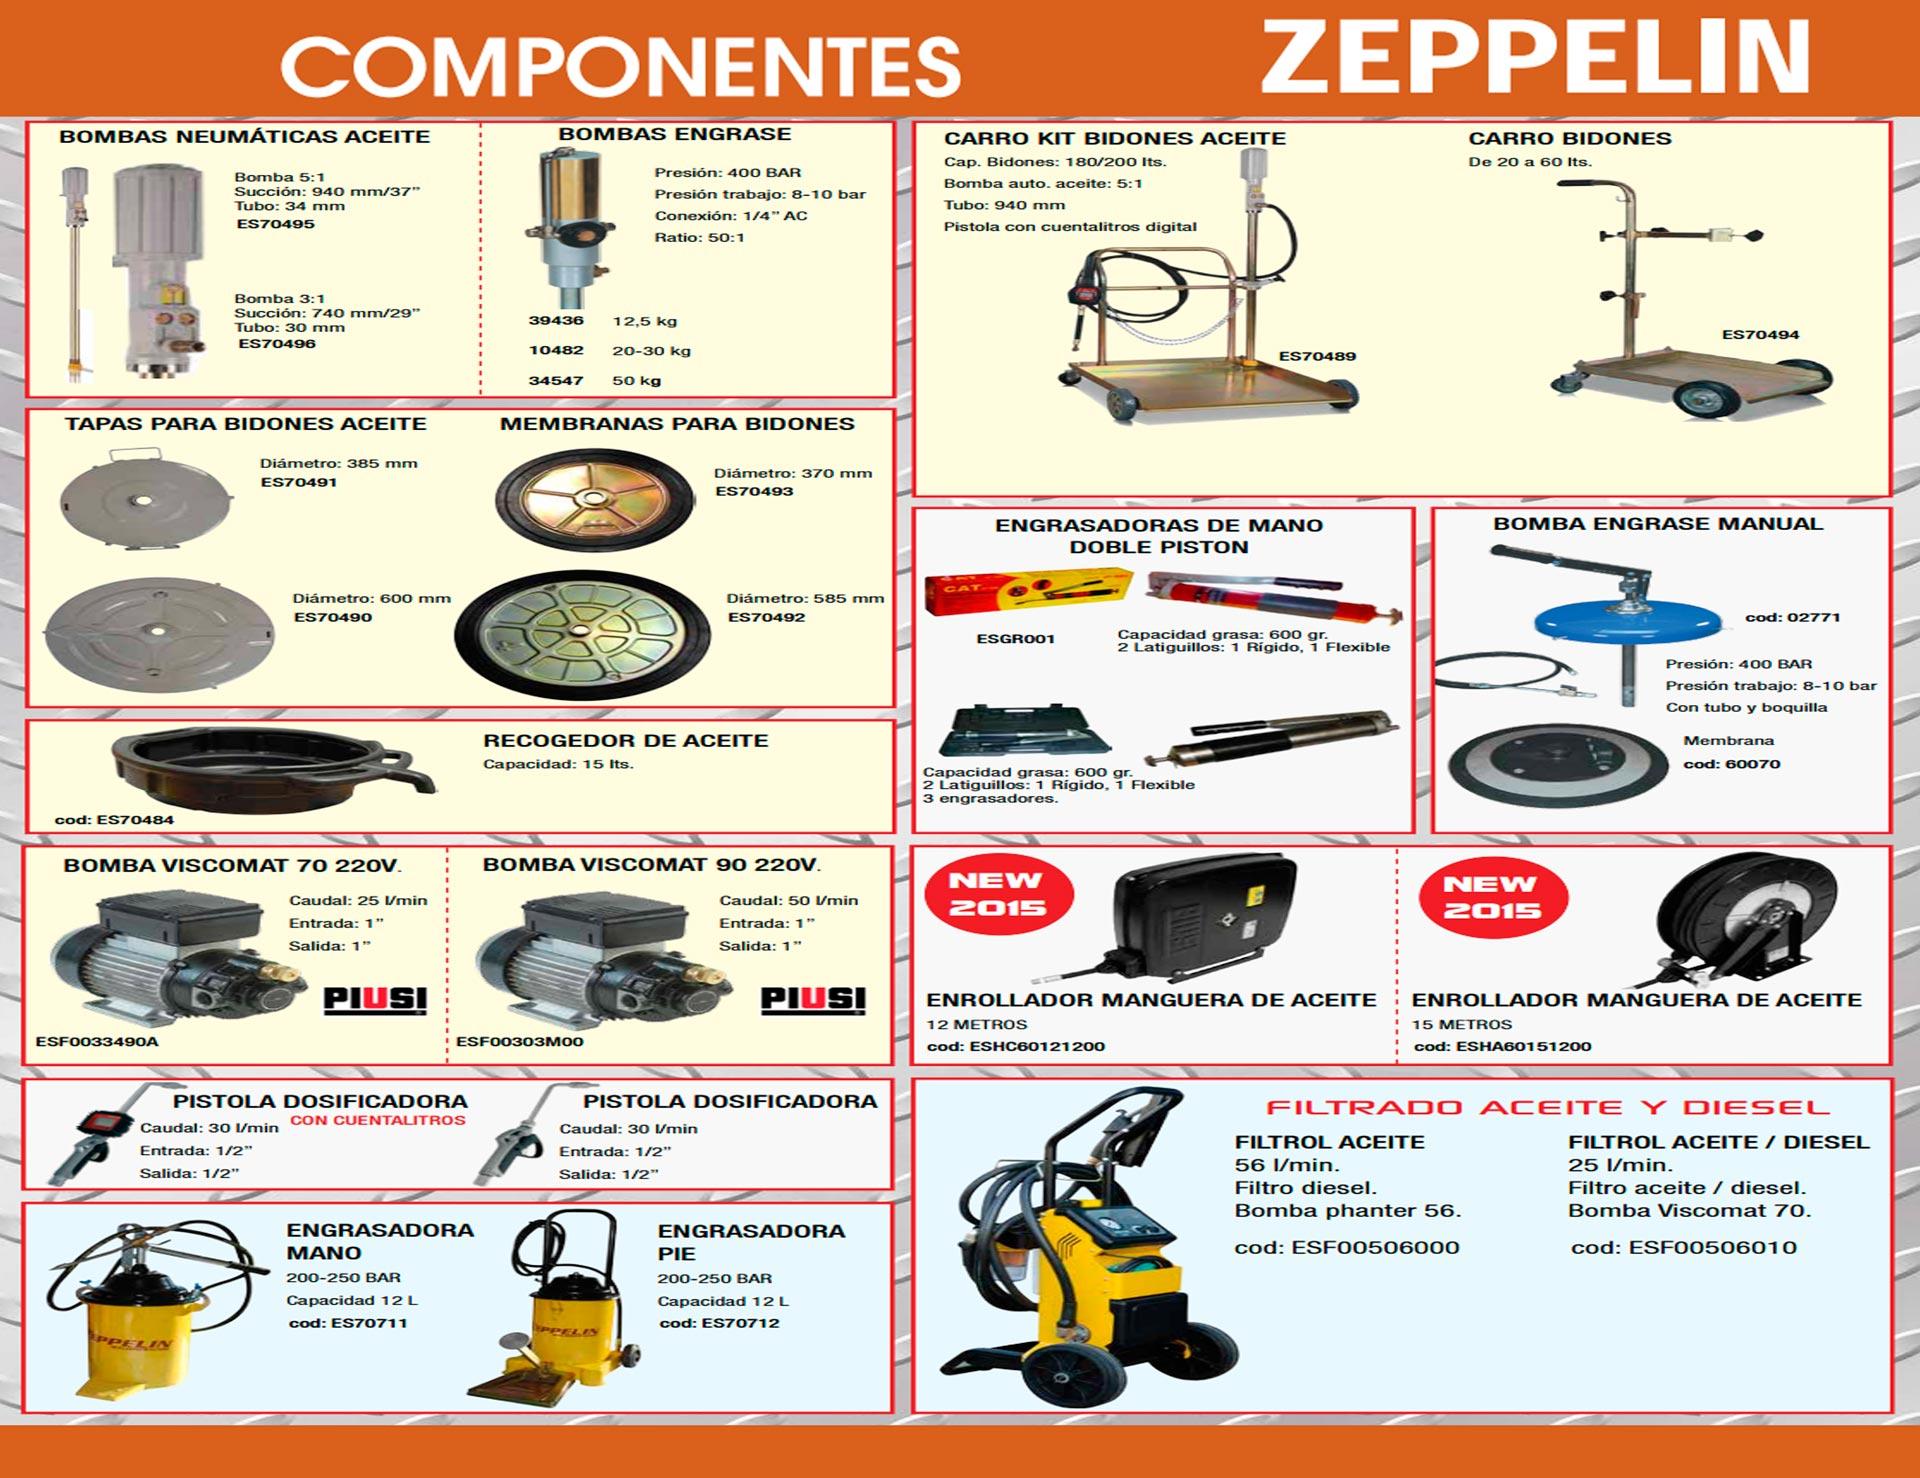 componentes_zeppelin.1920-png